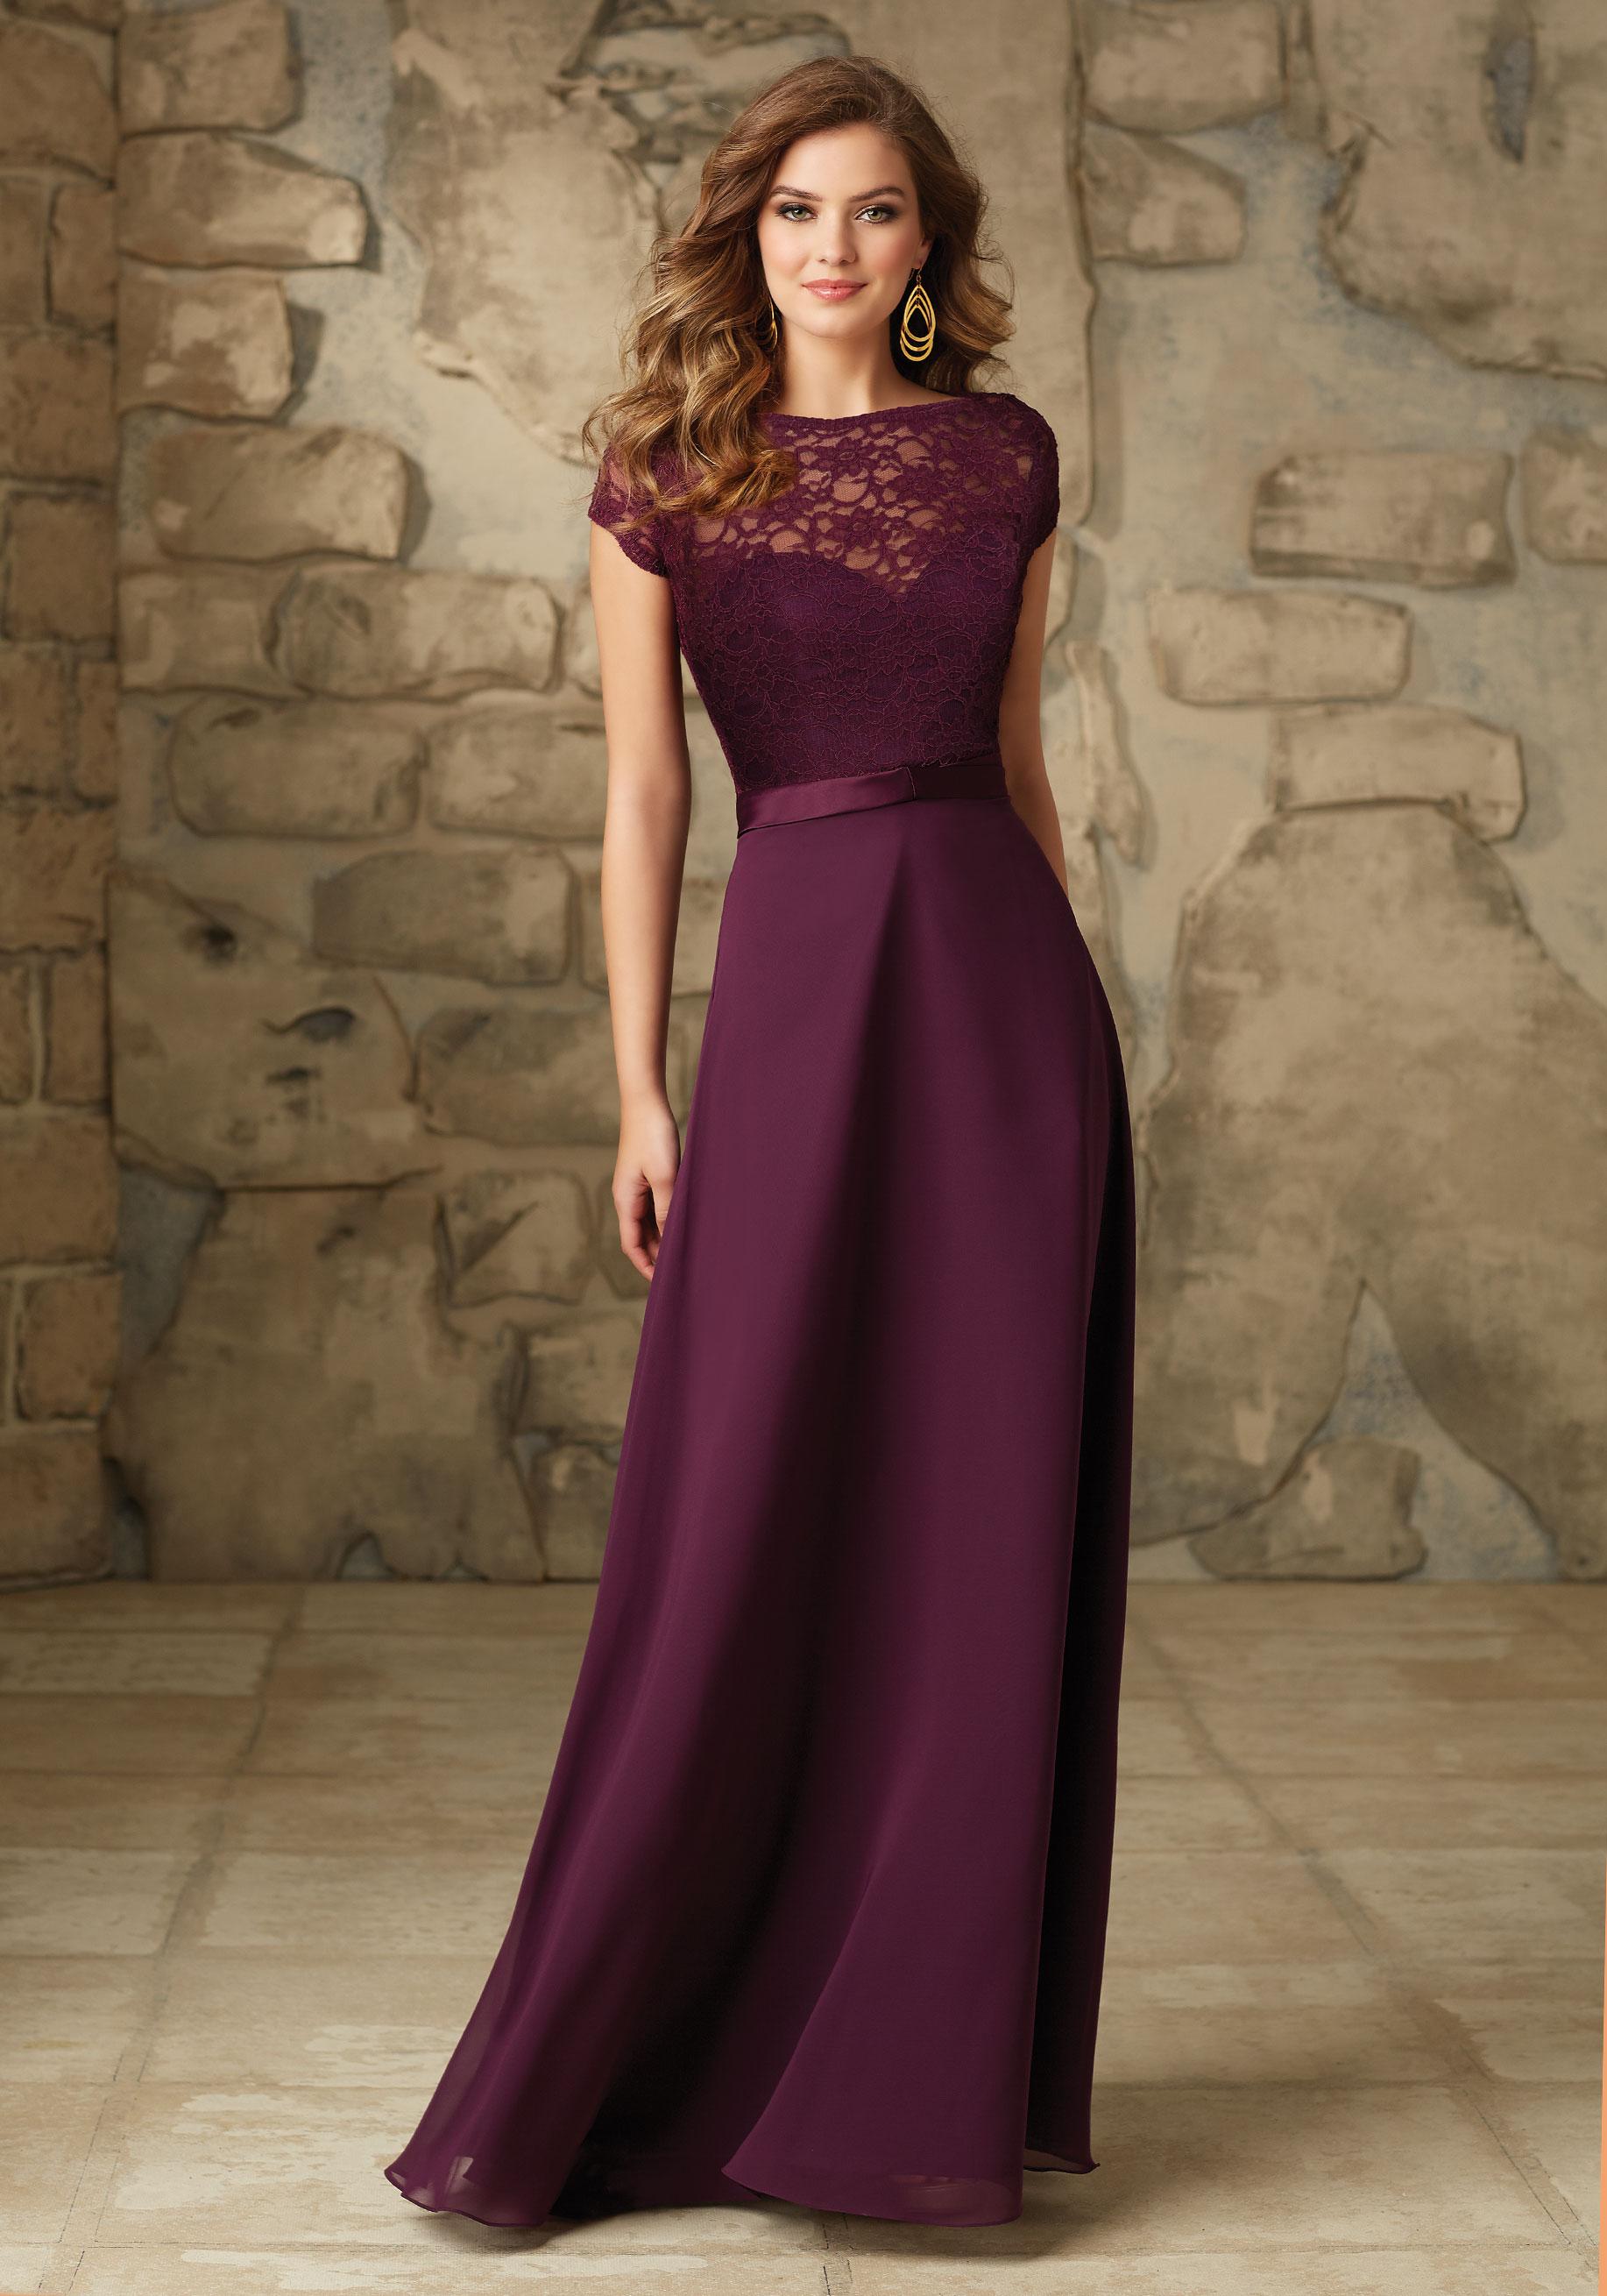 b121bd2299 Mori lee 101 bridesmaid dress - Catrinas Bridal